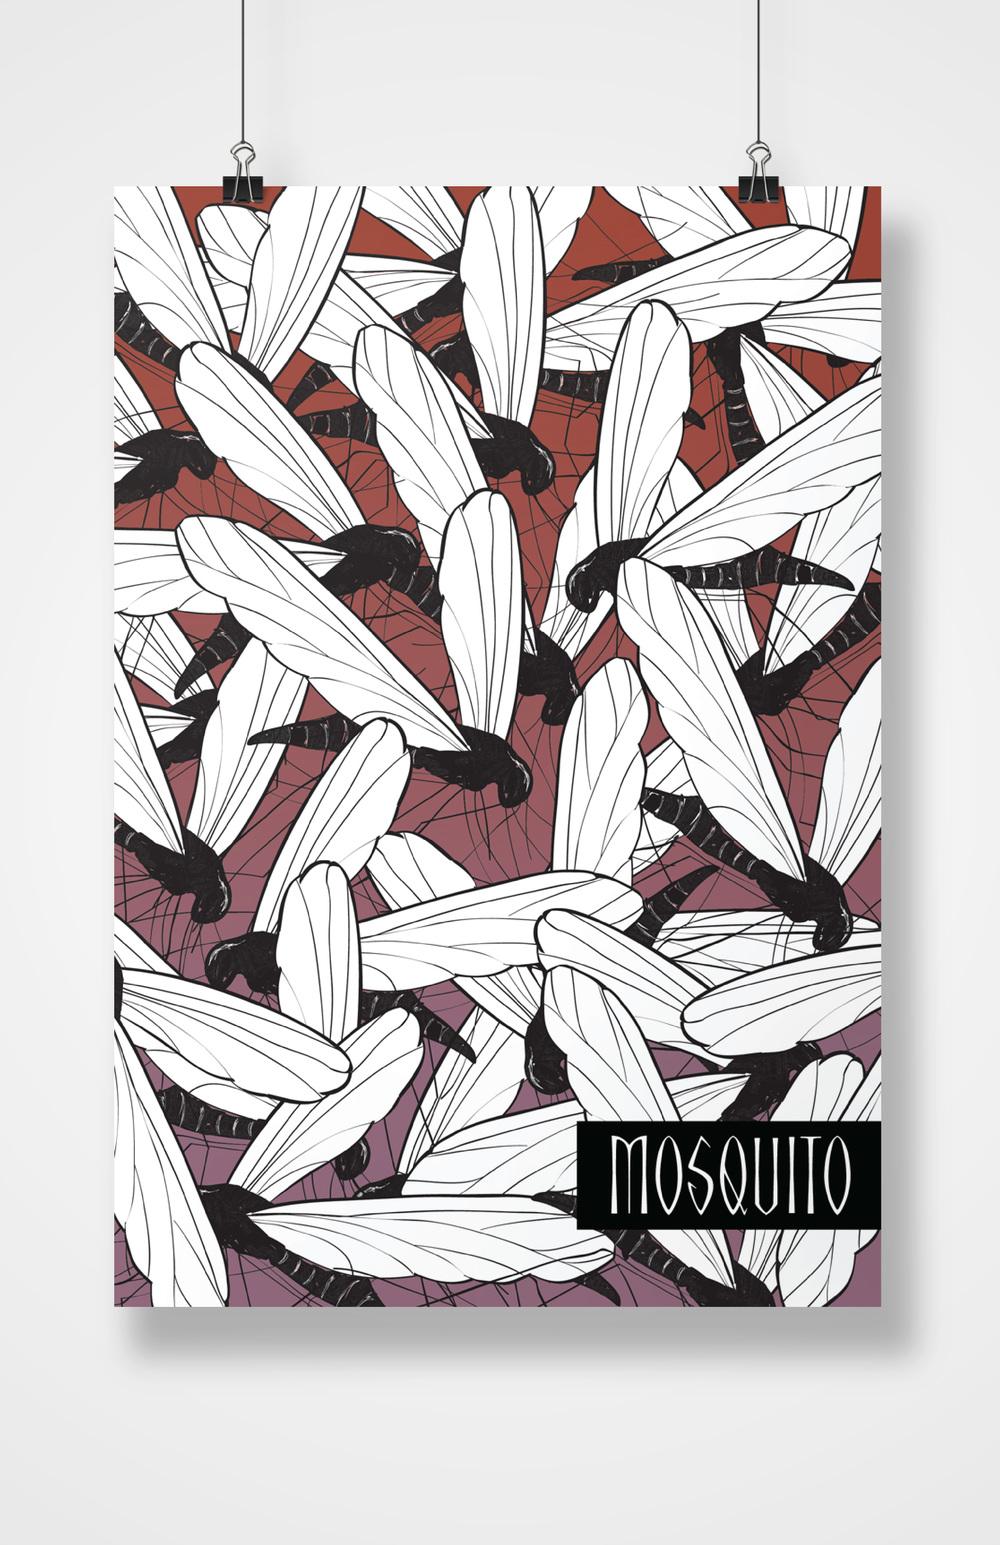 mosquito_poster_illustration_mockup-01.jpg